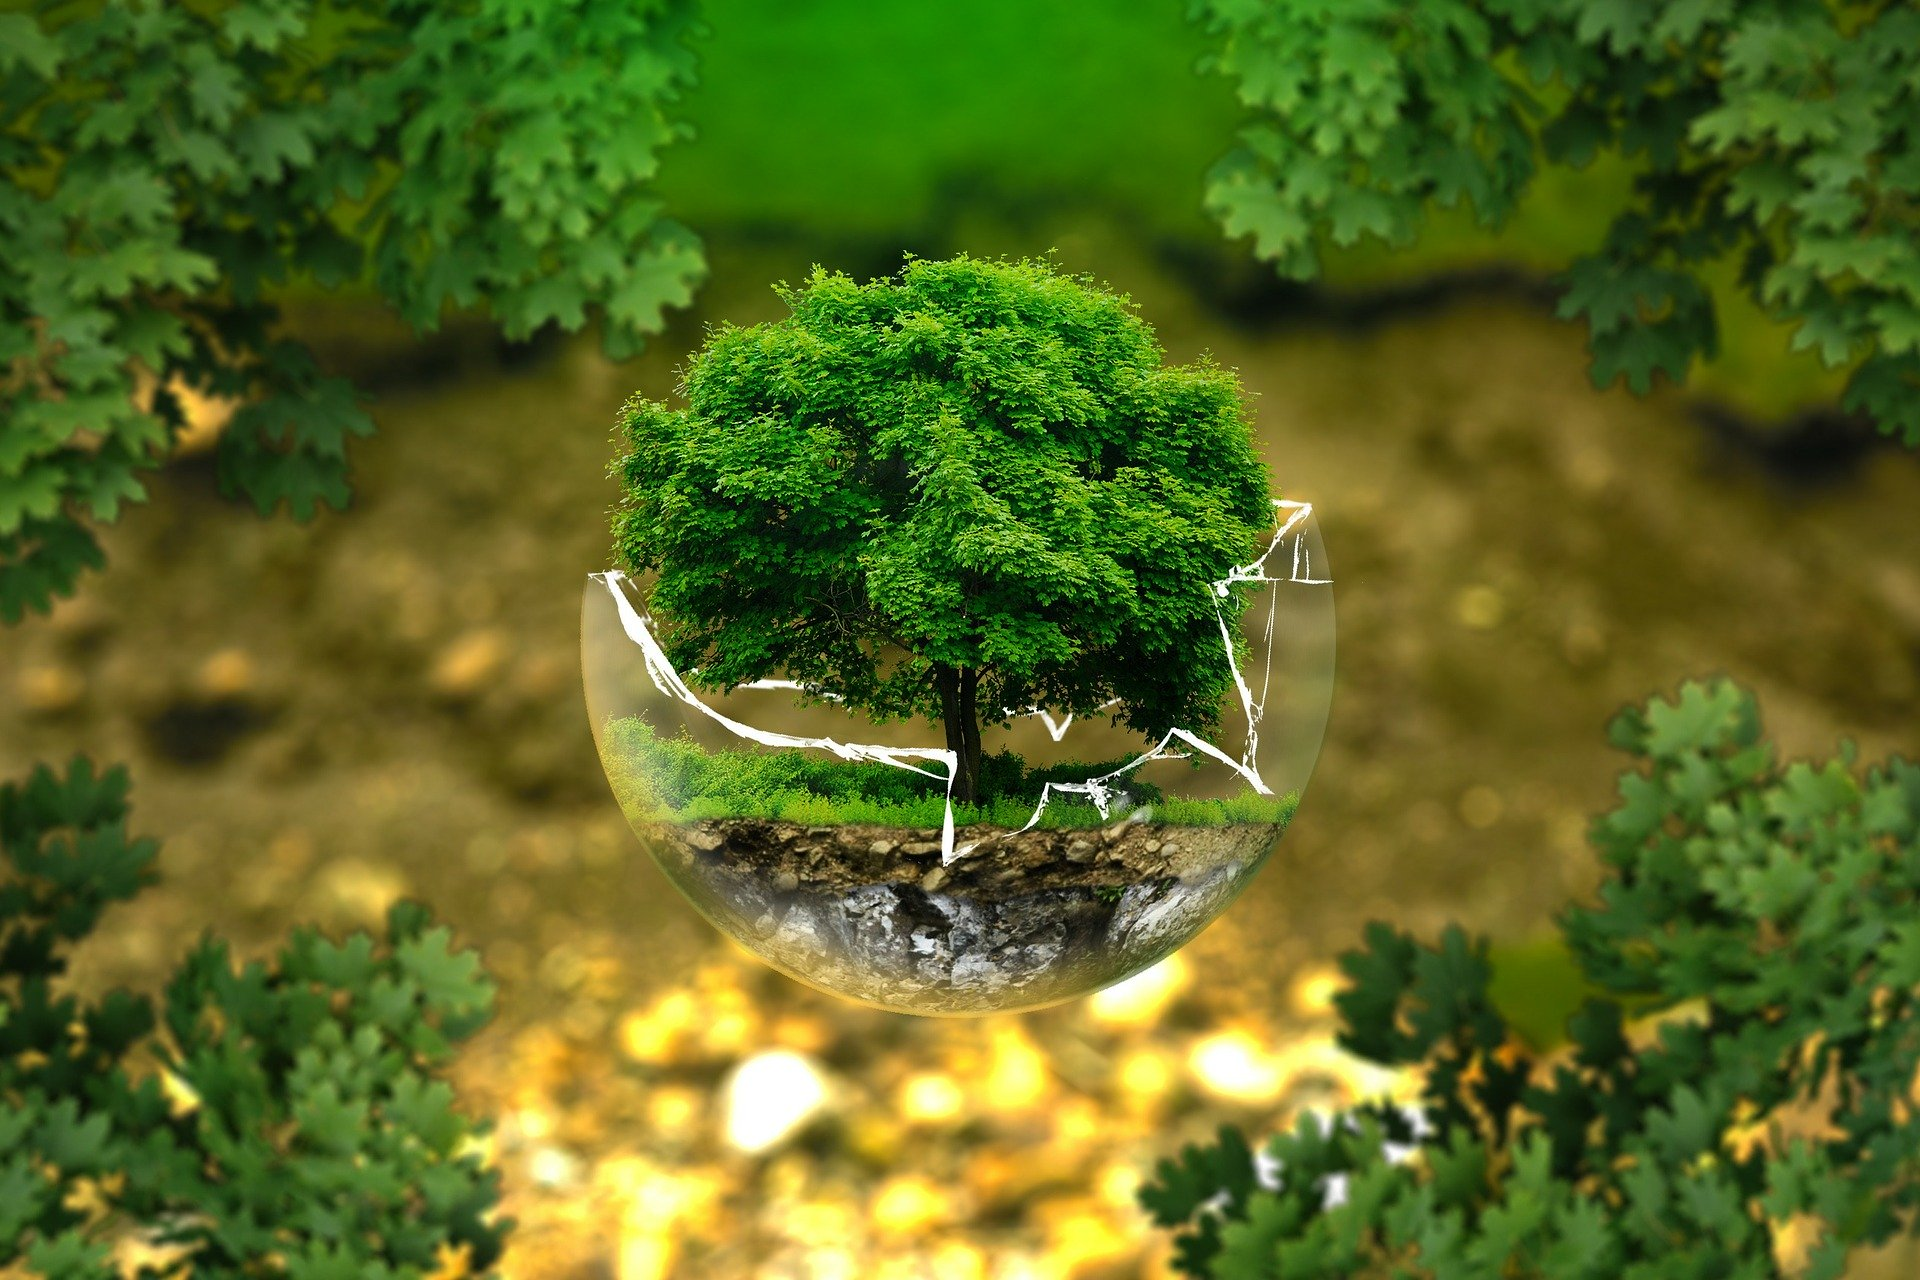 Il Qigong è una disciplina ambientalista